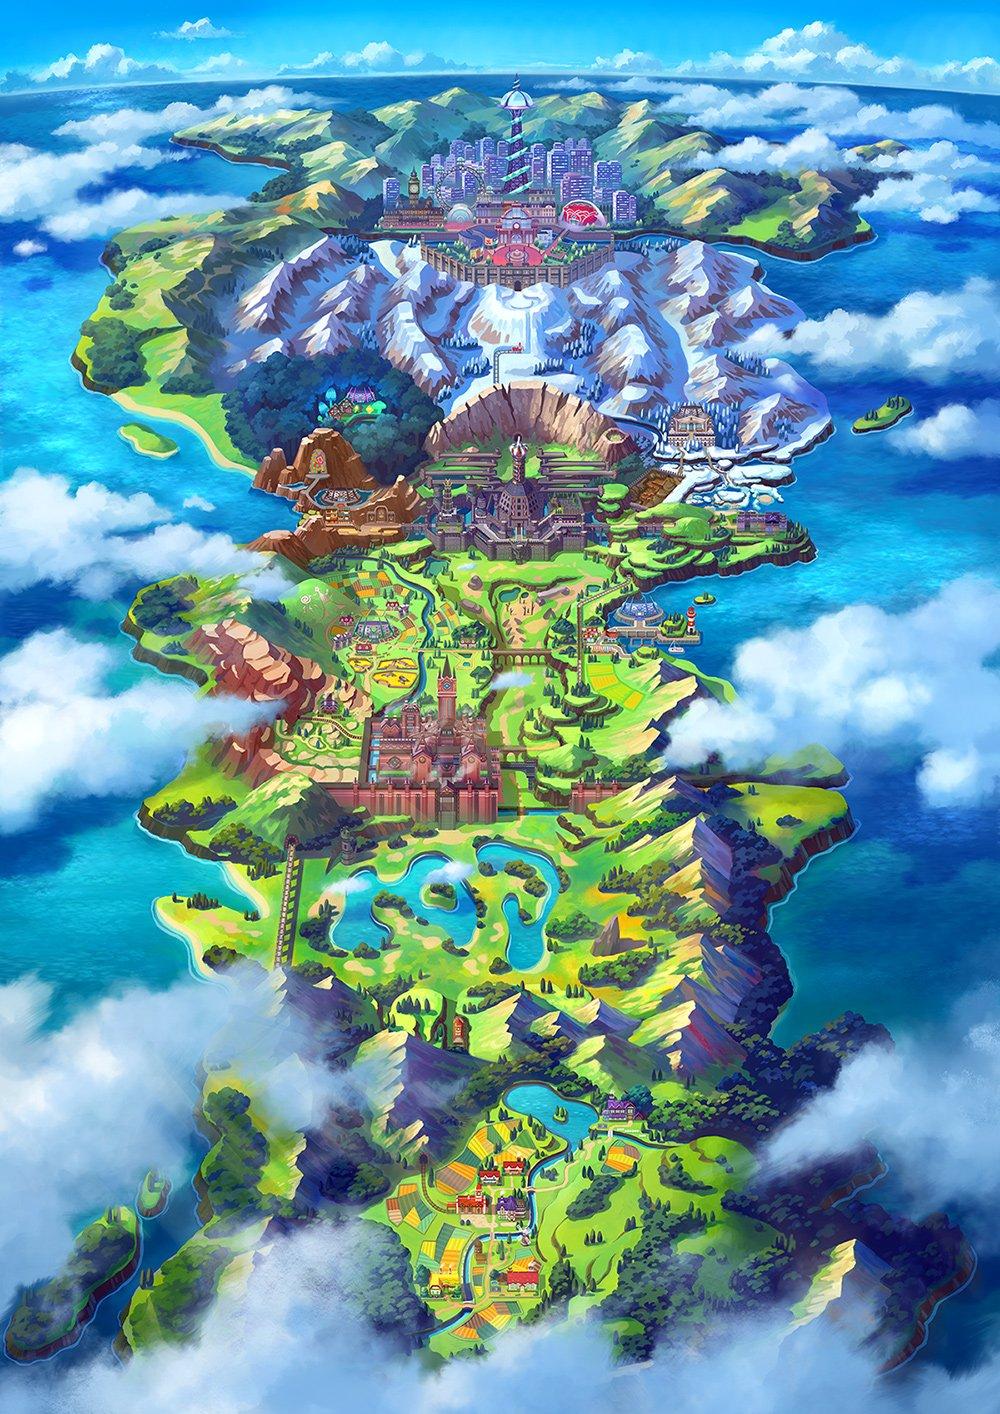 A full map of the Galar region